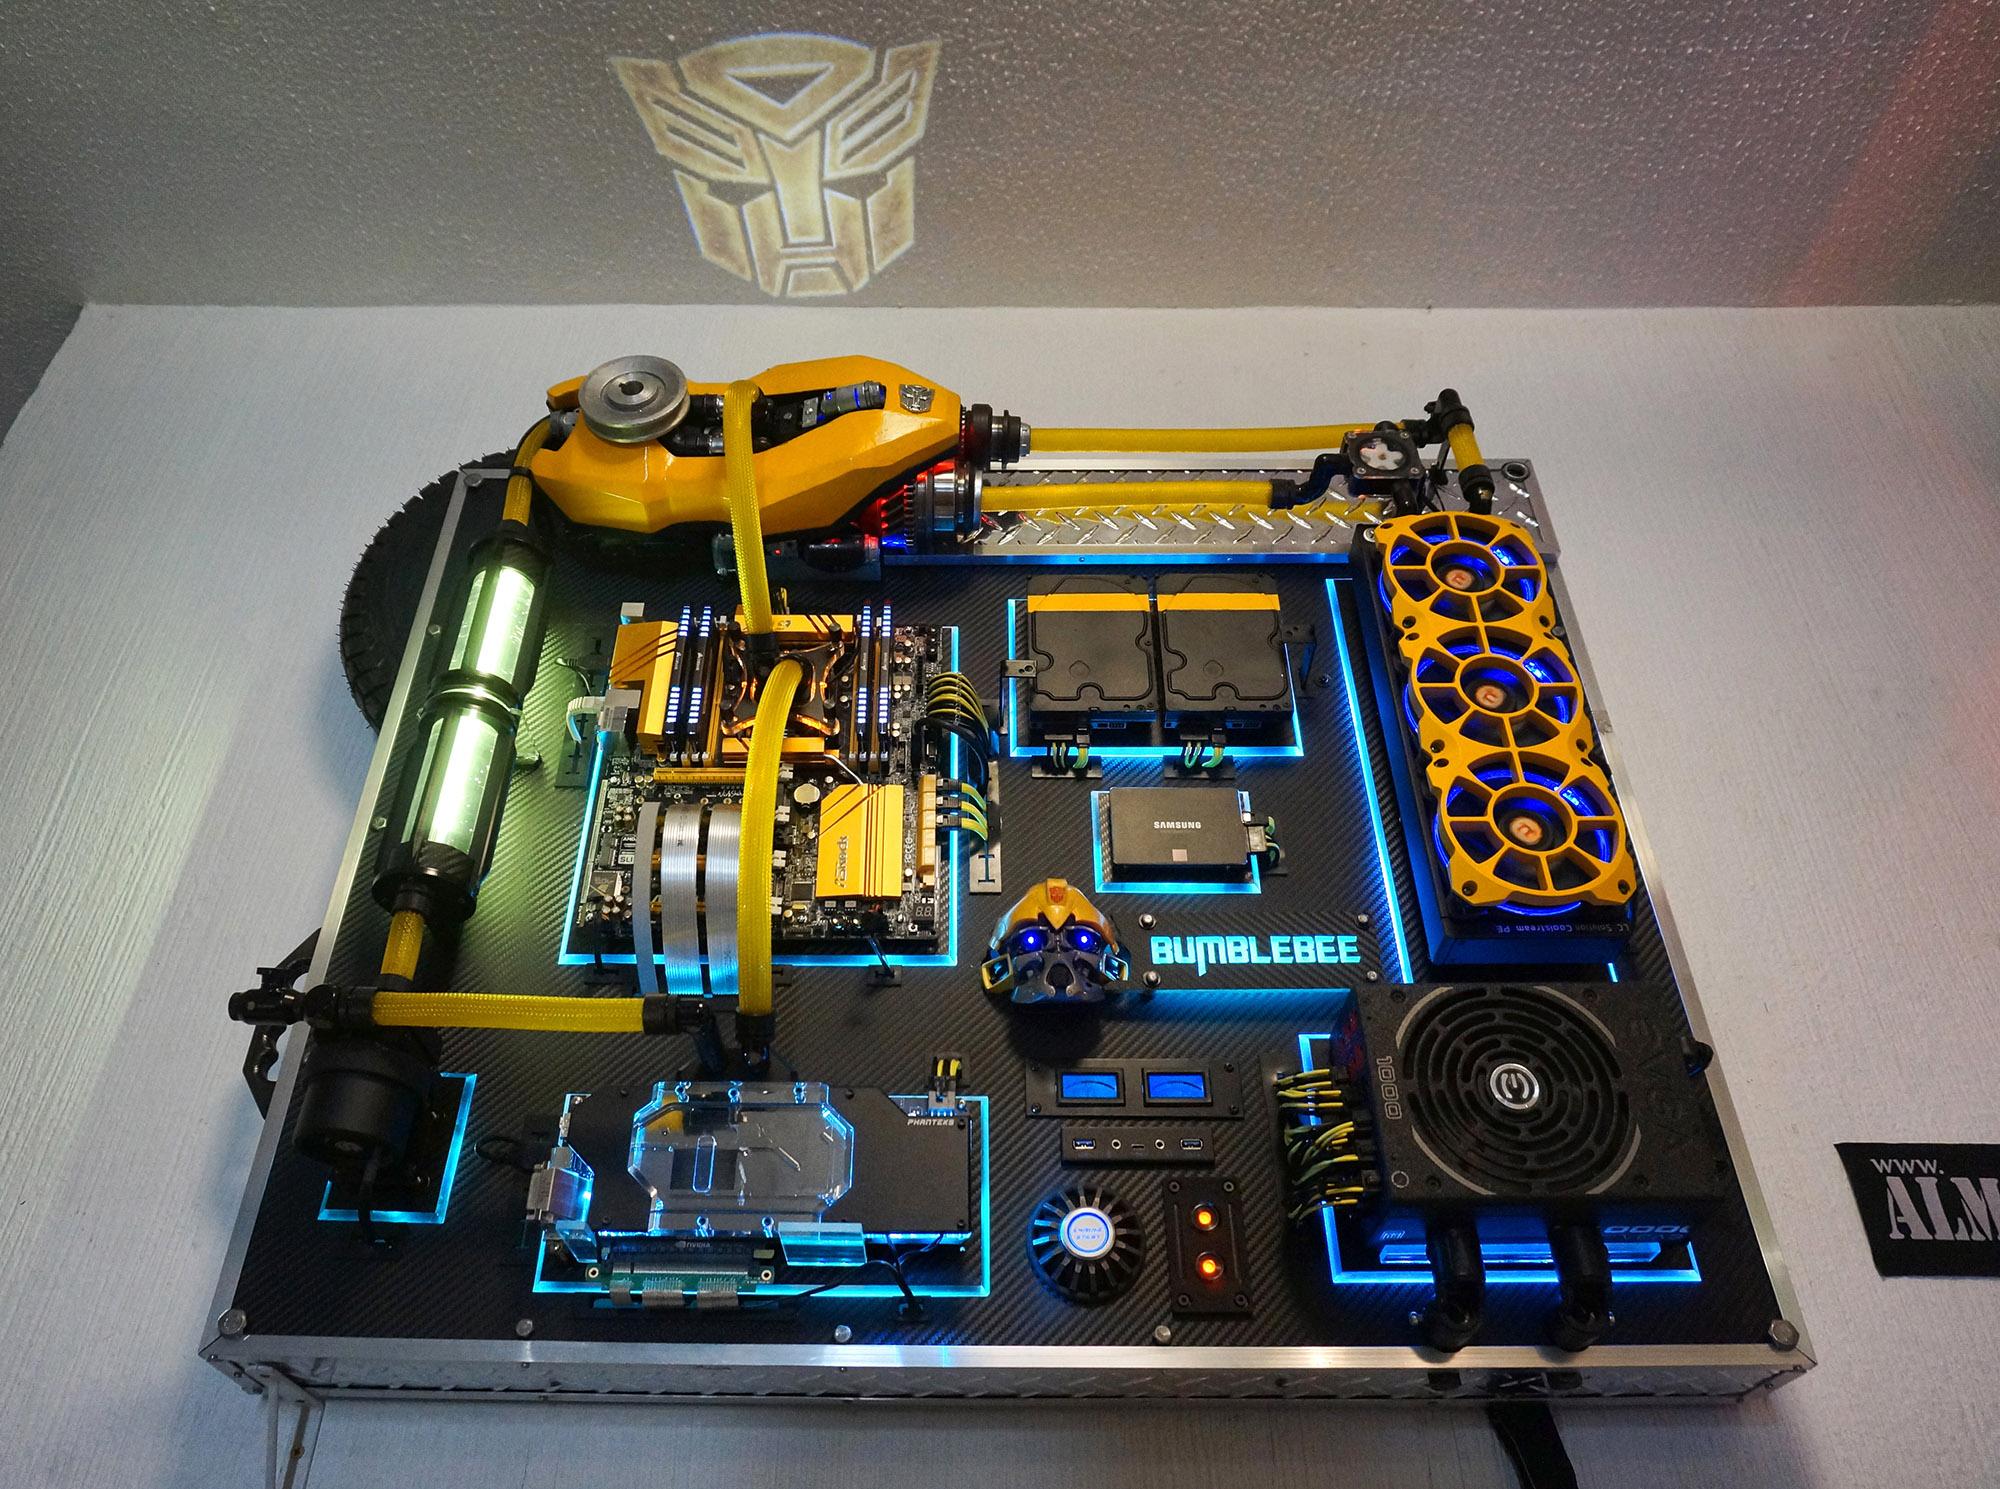 Wallmounted PC  Bumblebee 36 core workstation  Build Logs  Linus Tech Tips